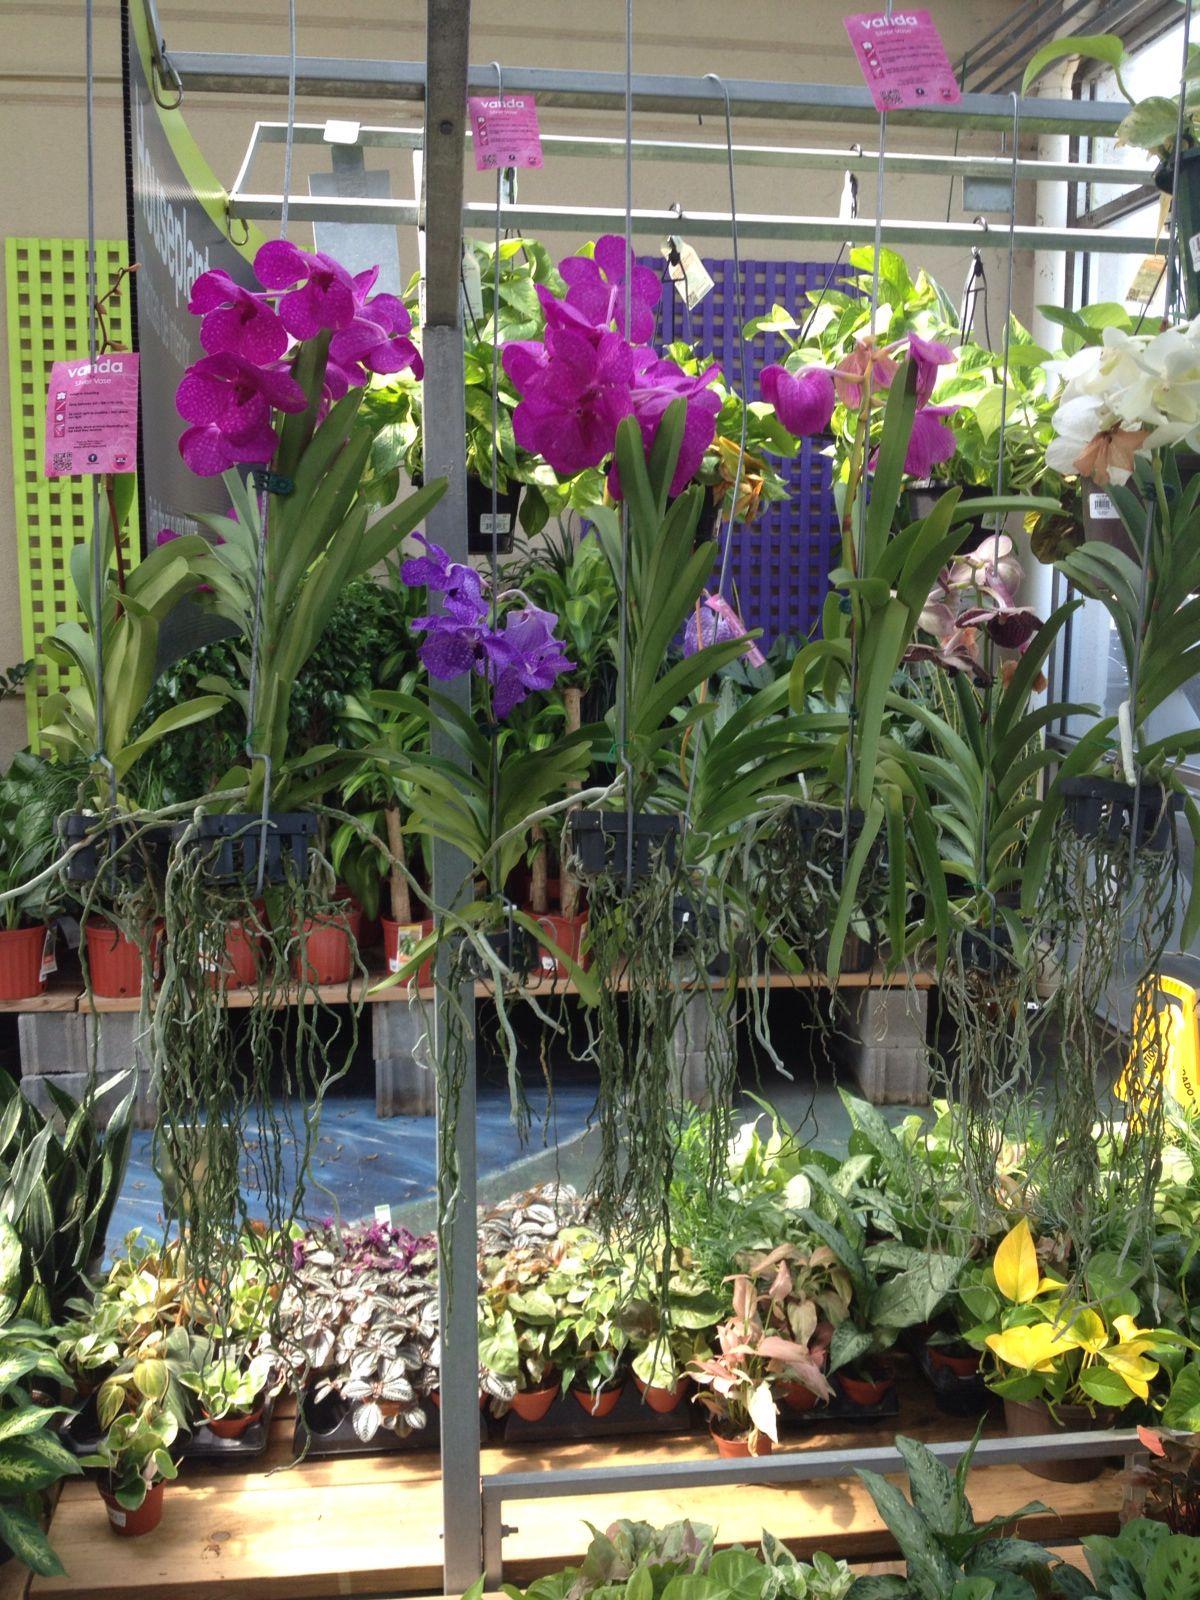 Vanda Orchids At Home Depot In Greensboro Nc Vanda Orchids Orchids Plants